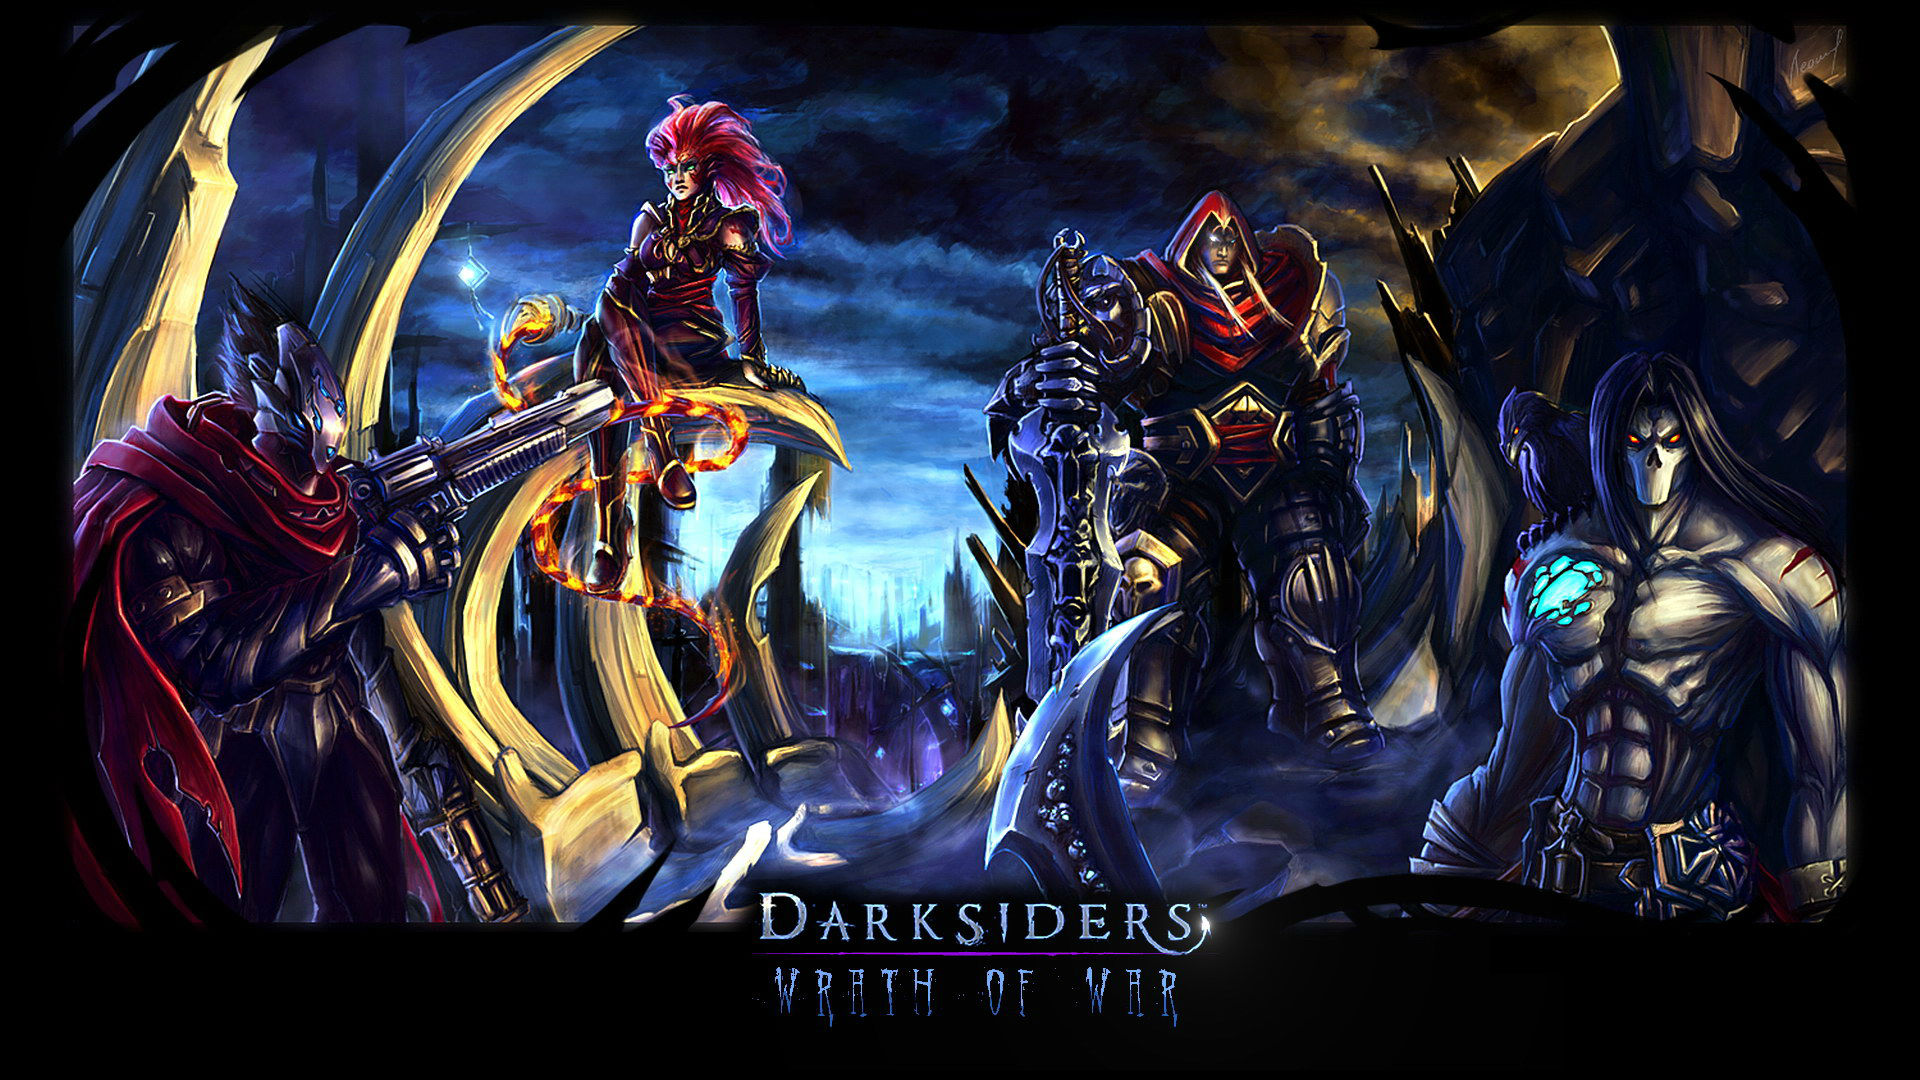 Some Sweet Darksiders Wallpapers   Darksiders Dungeon 1920x1080